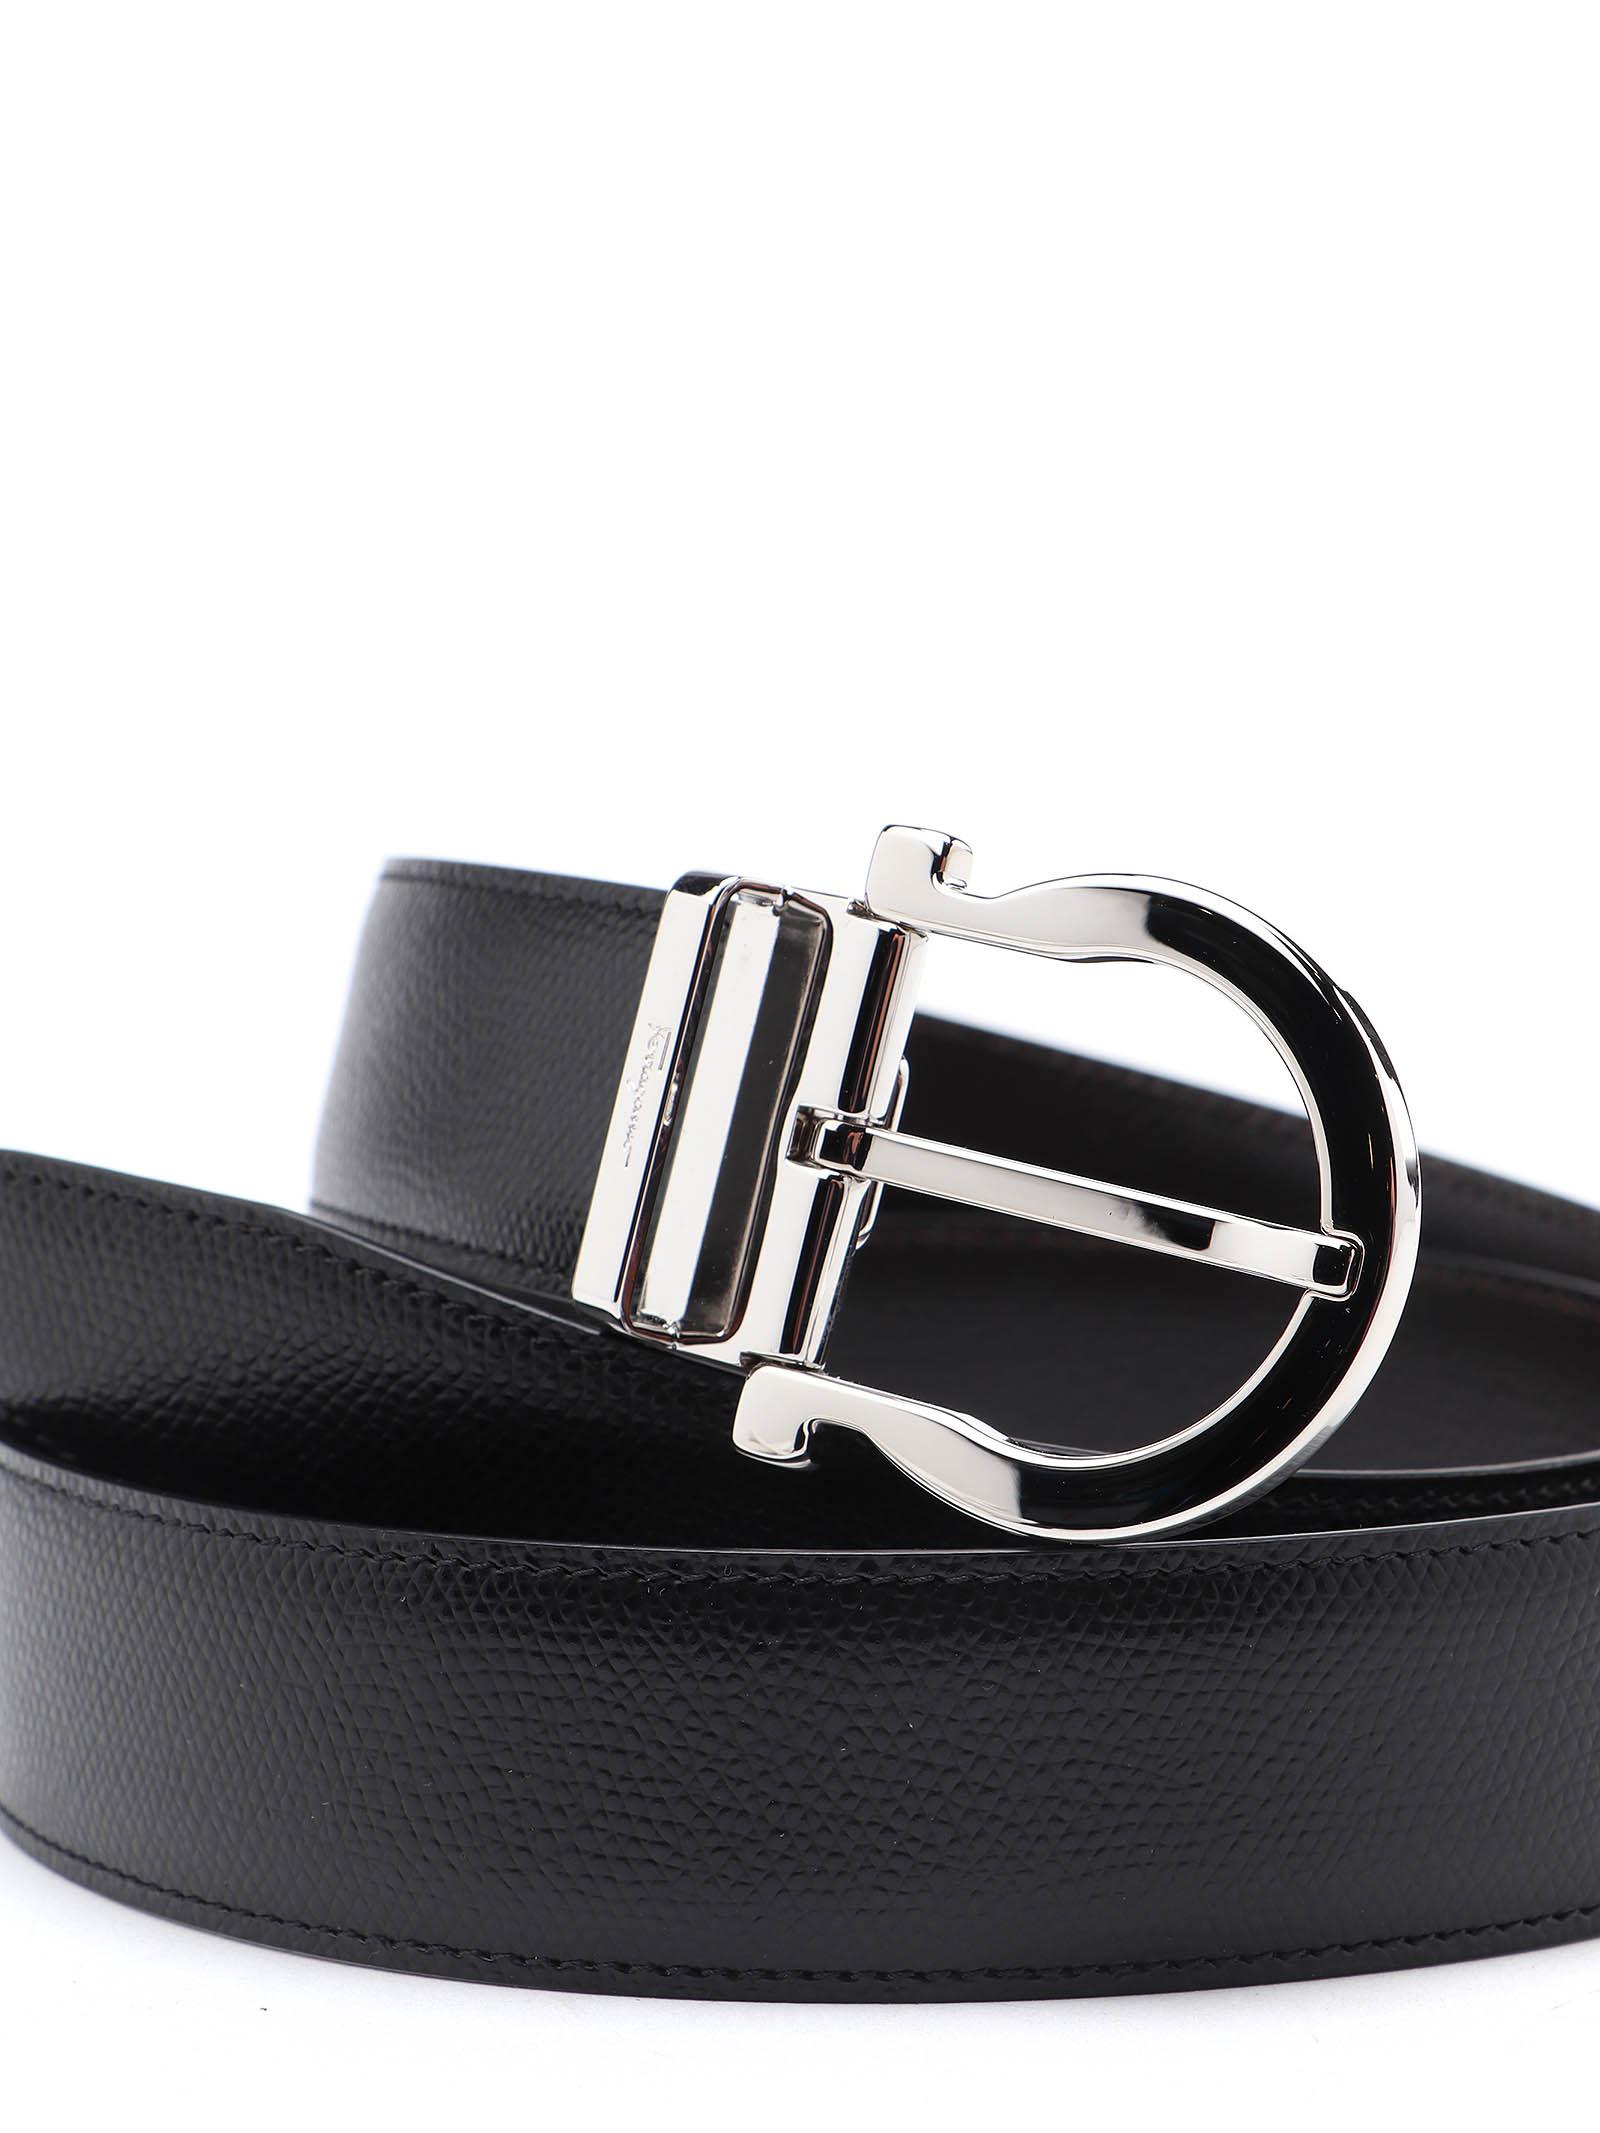 Immagine di Salvatore Ferragamo | Double Adjustable Belt 3,5